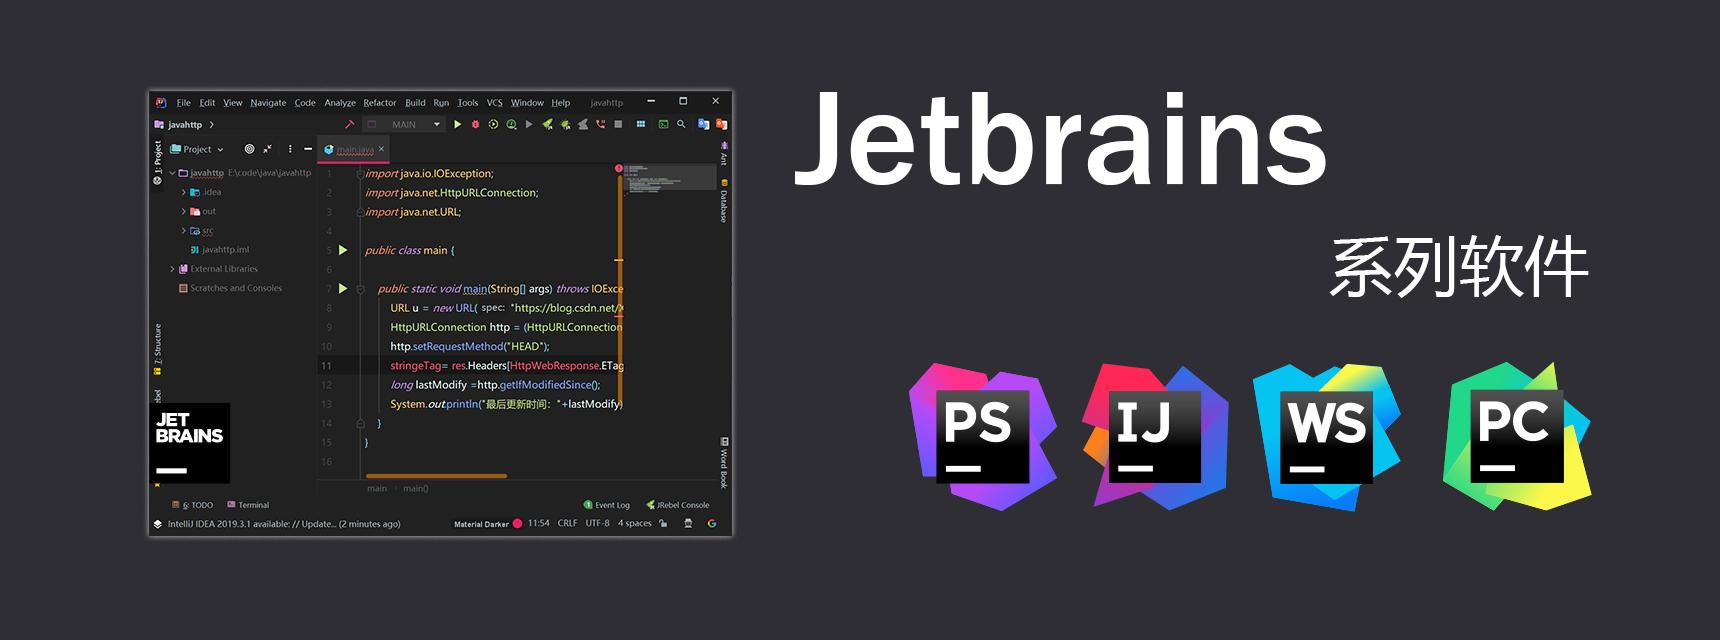 Jetbrains IDE系列软件